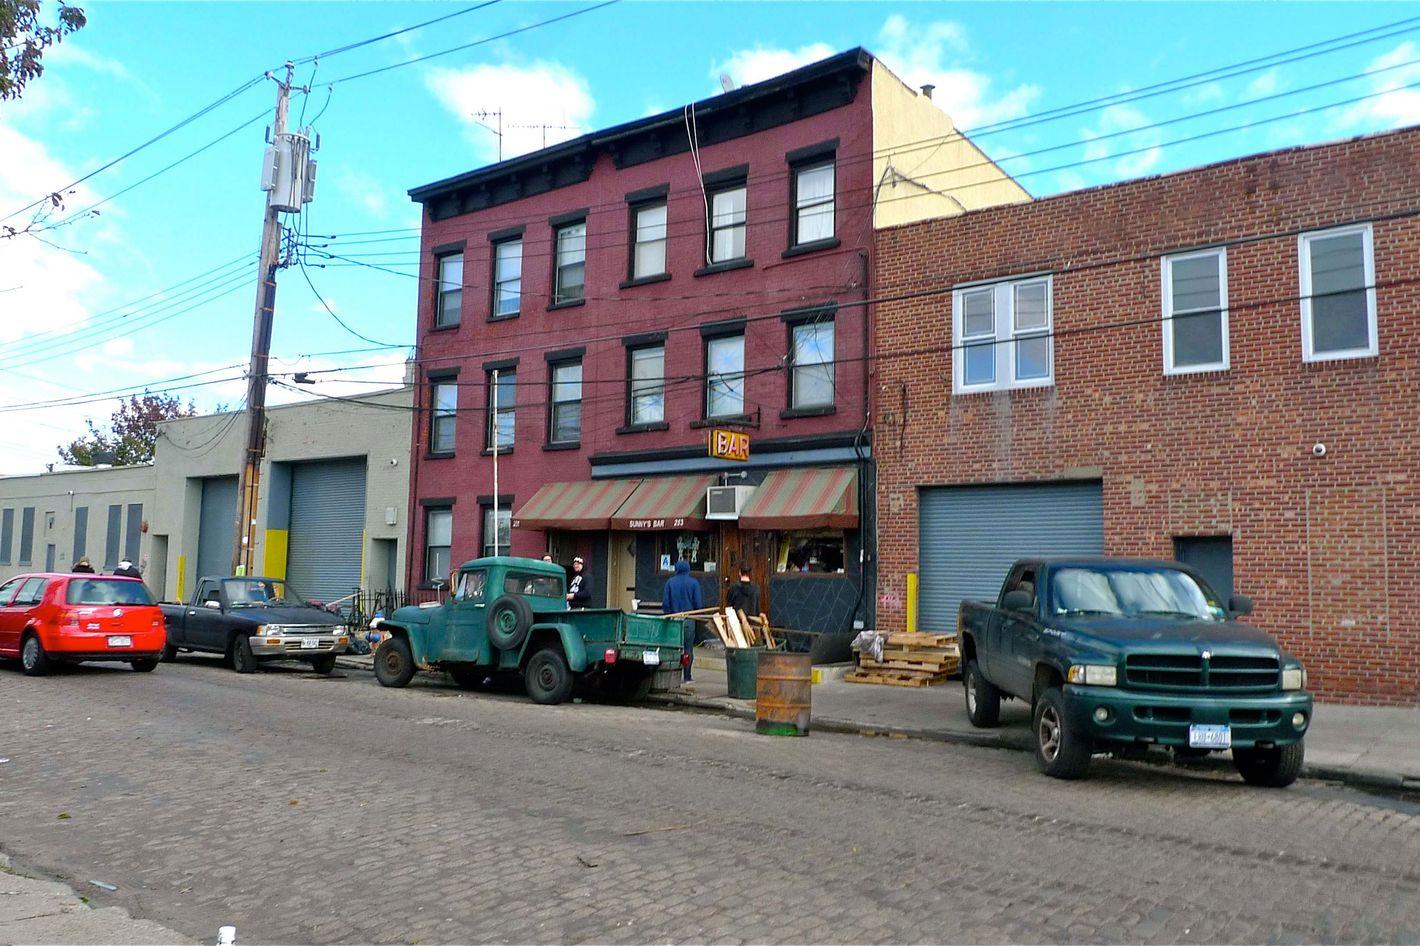 Sunny's, six days after Hurricane Sandy.